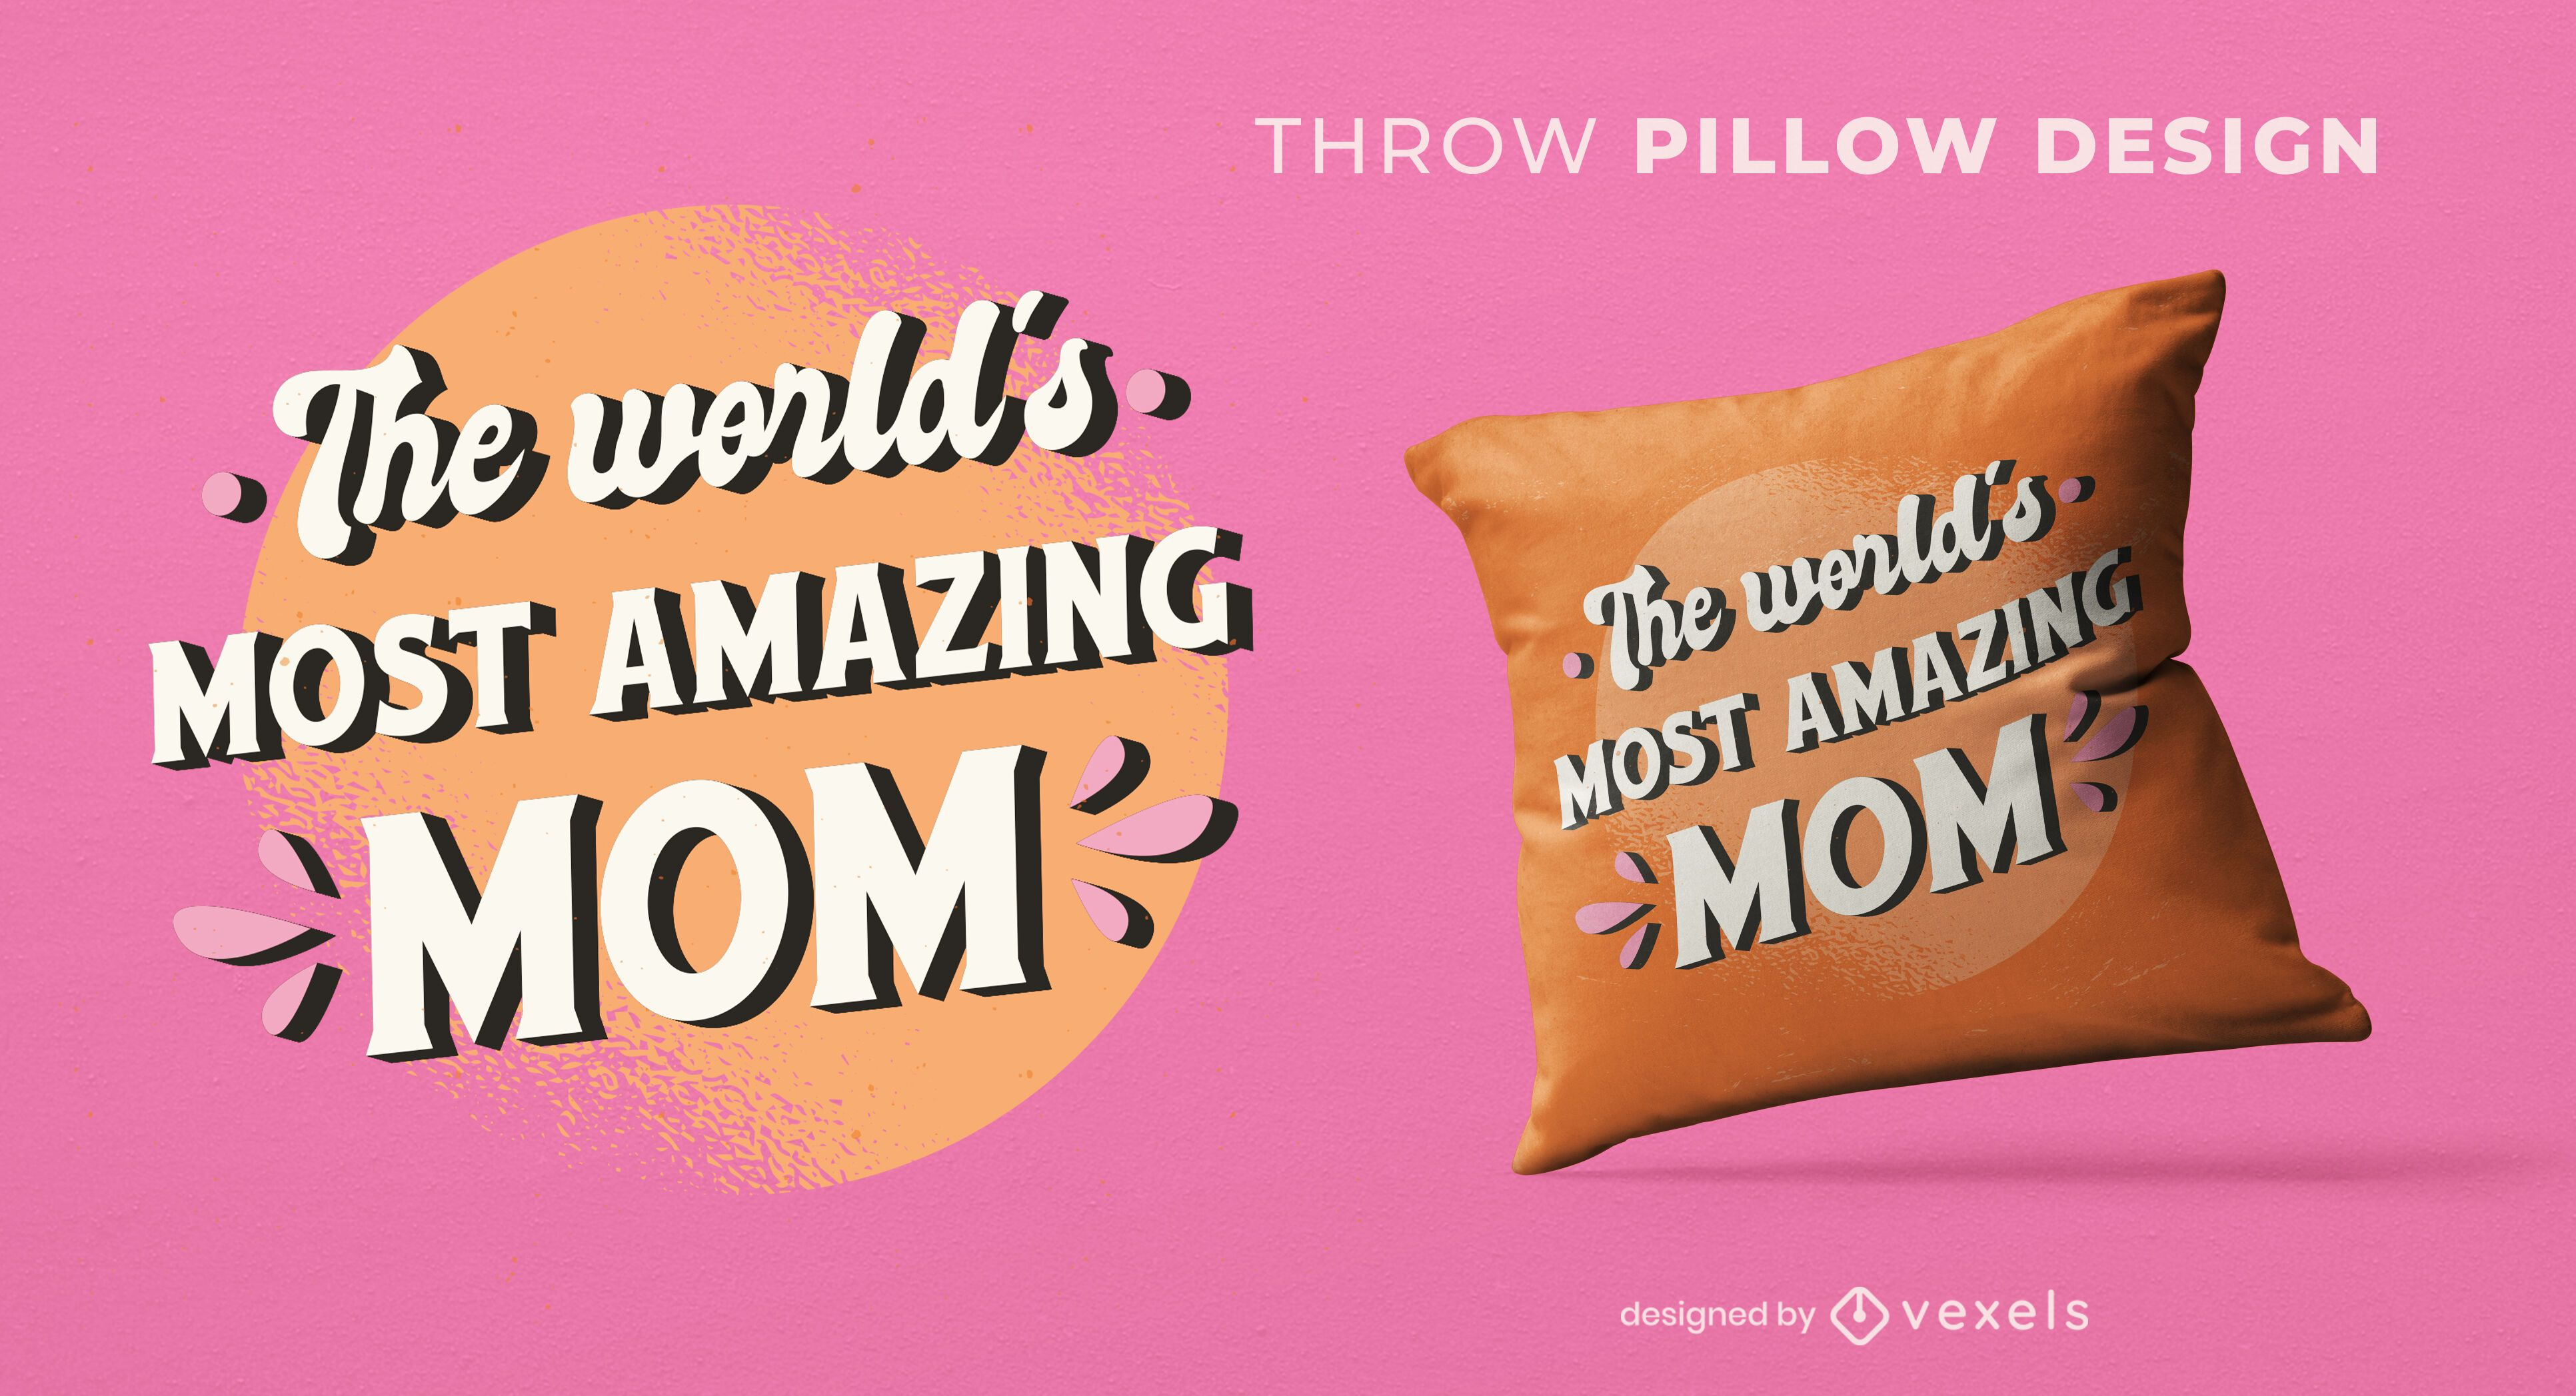 Most amazing mom throw pillow design